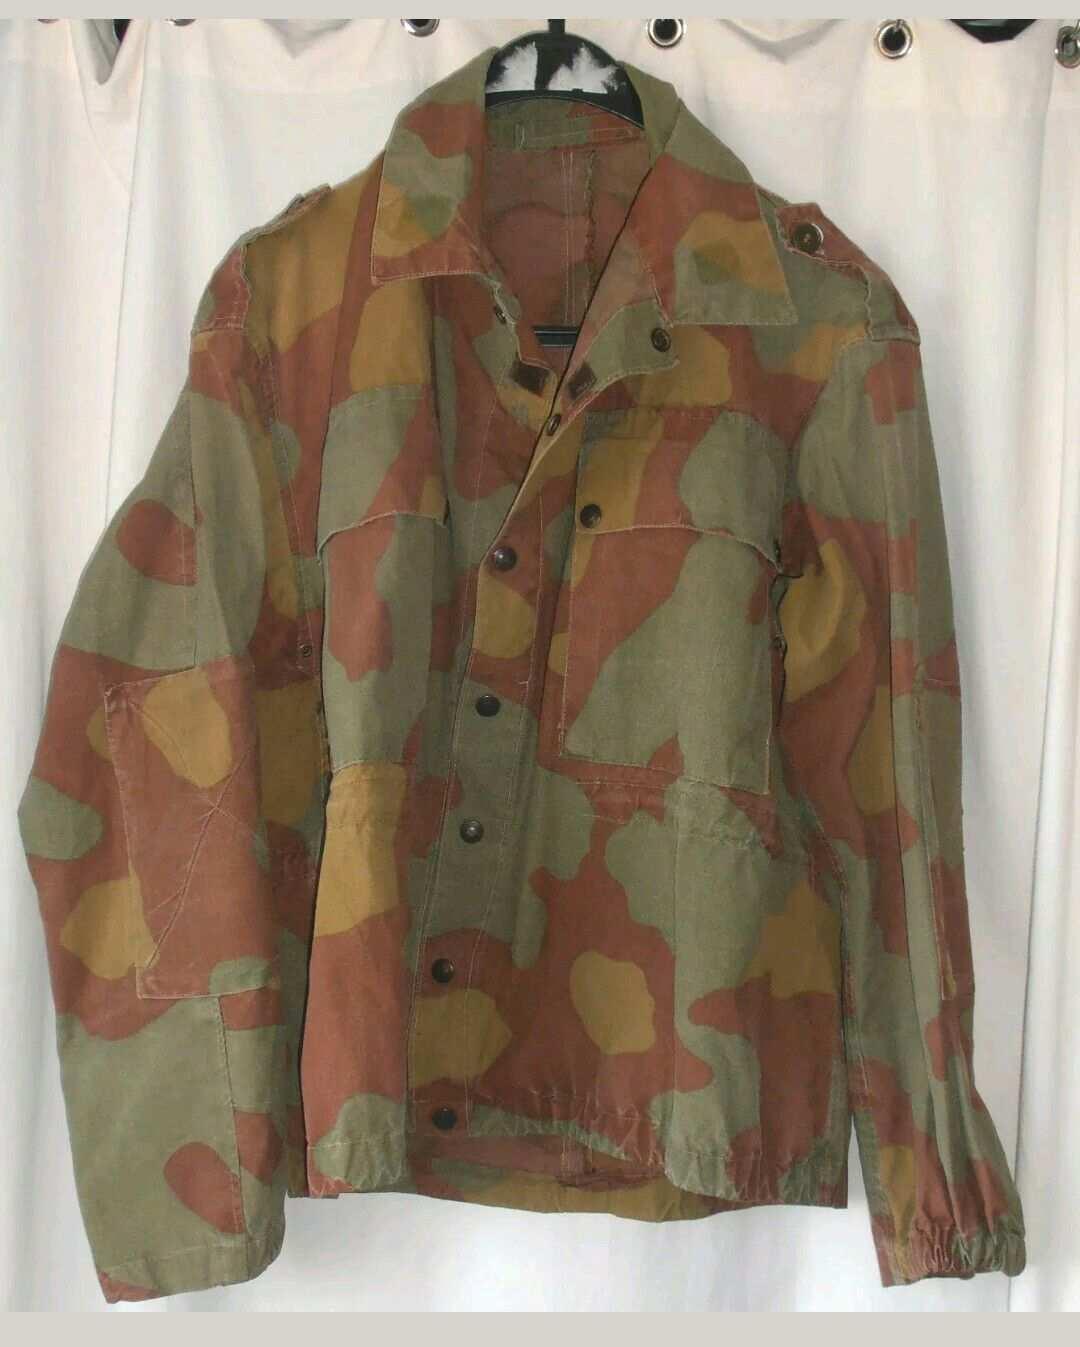 M29 Shirt Army Uniform Military Jacket Camouflage